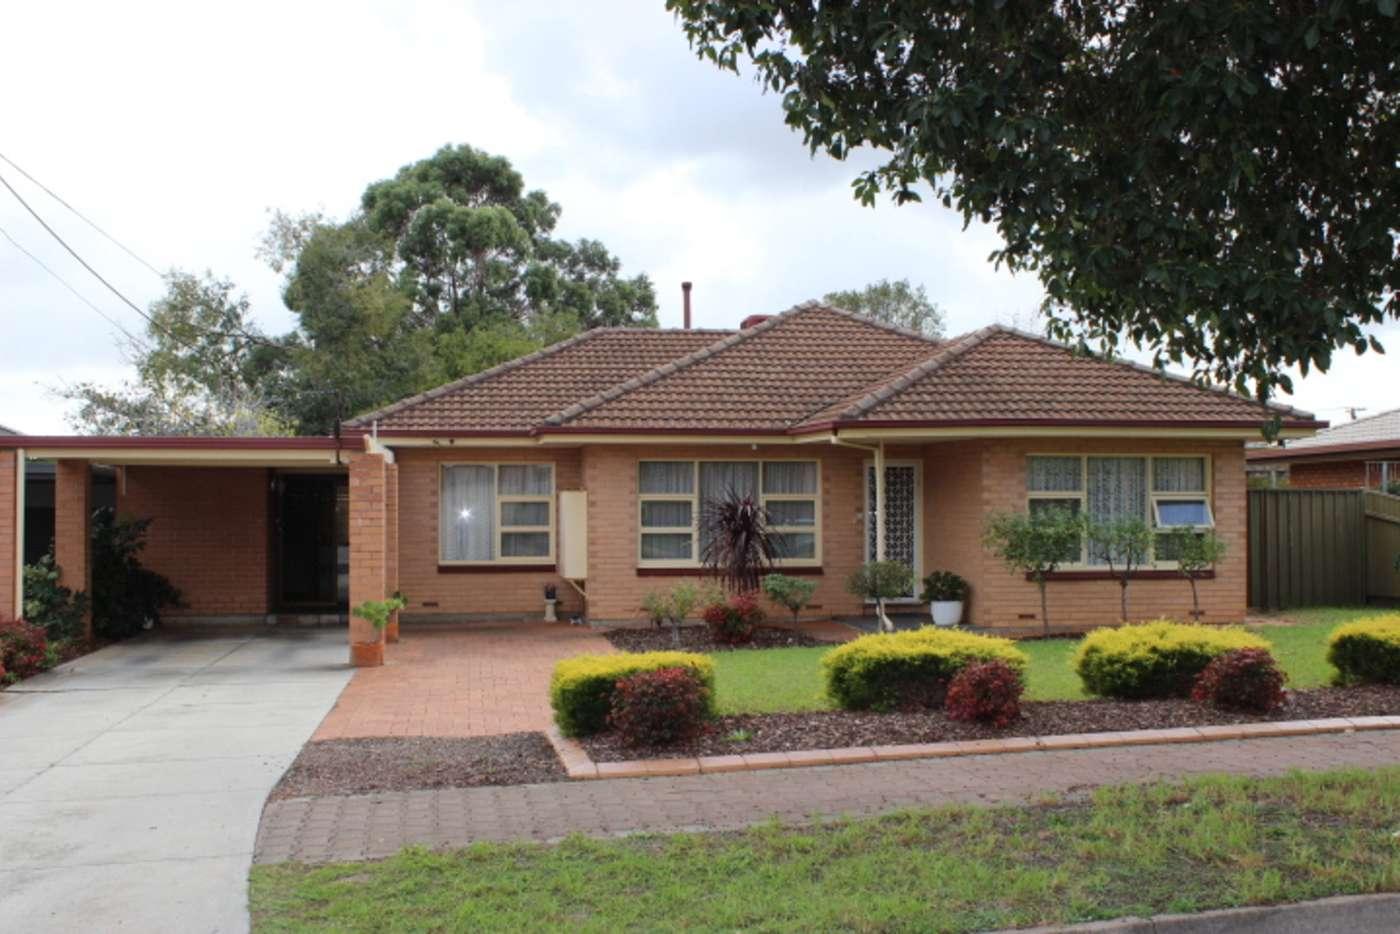 Main view of Homely house listing, 4 Birch Grove, Dernancourt SA 5075